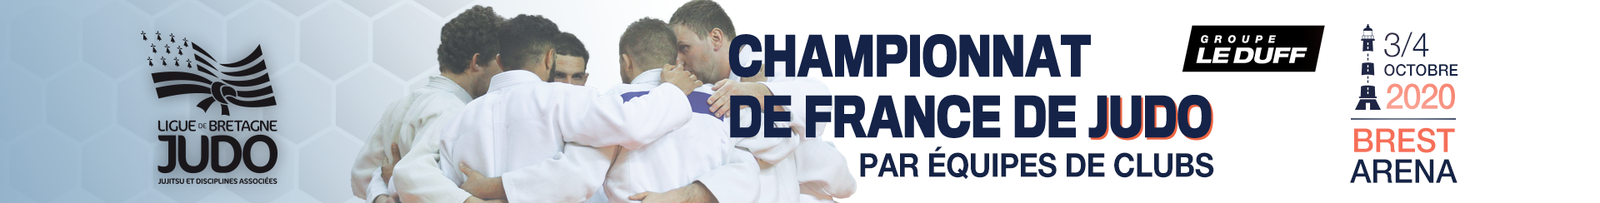 Billeterie du Championnat de France Brest Arena 2020